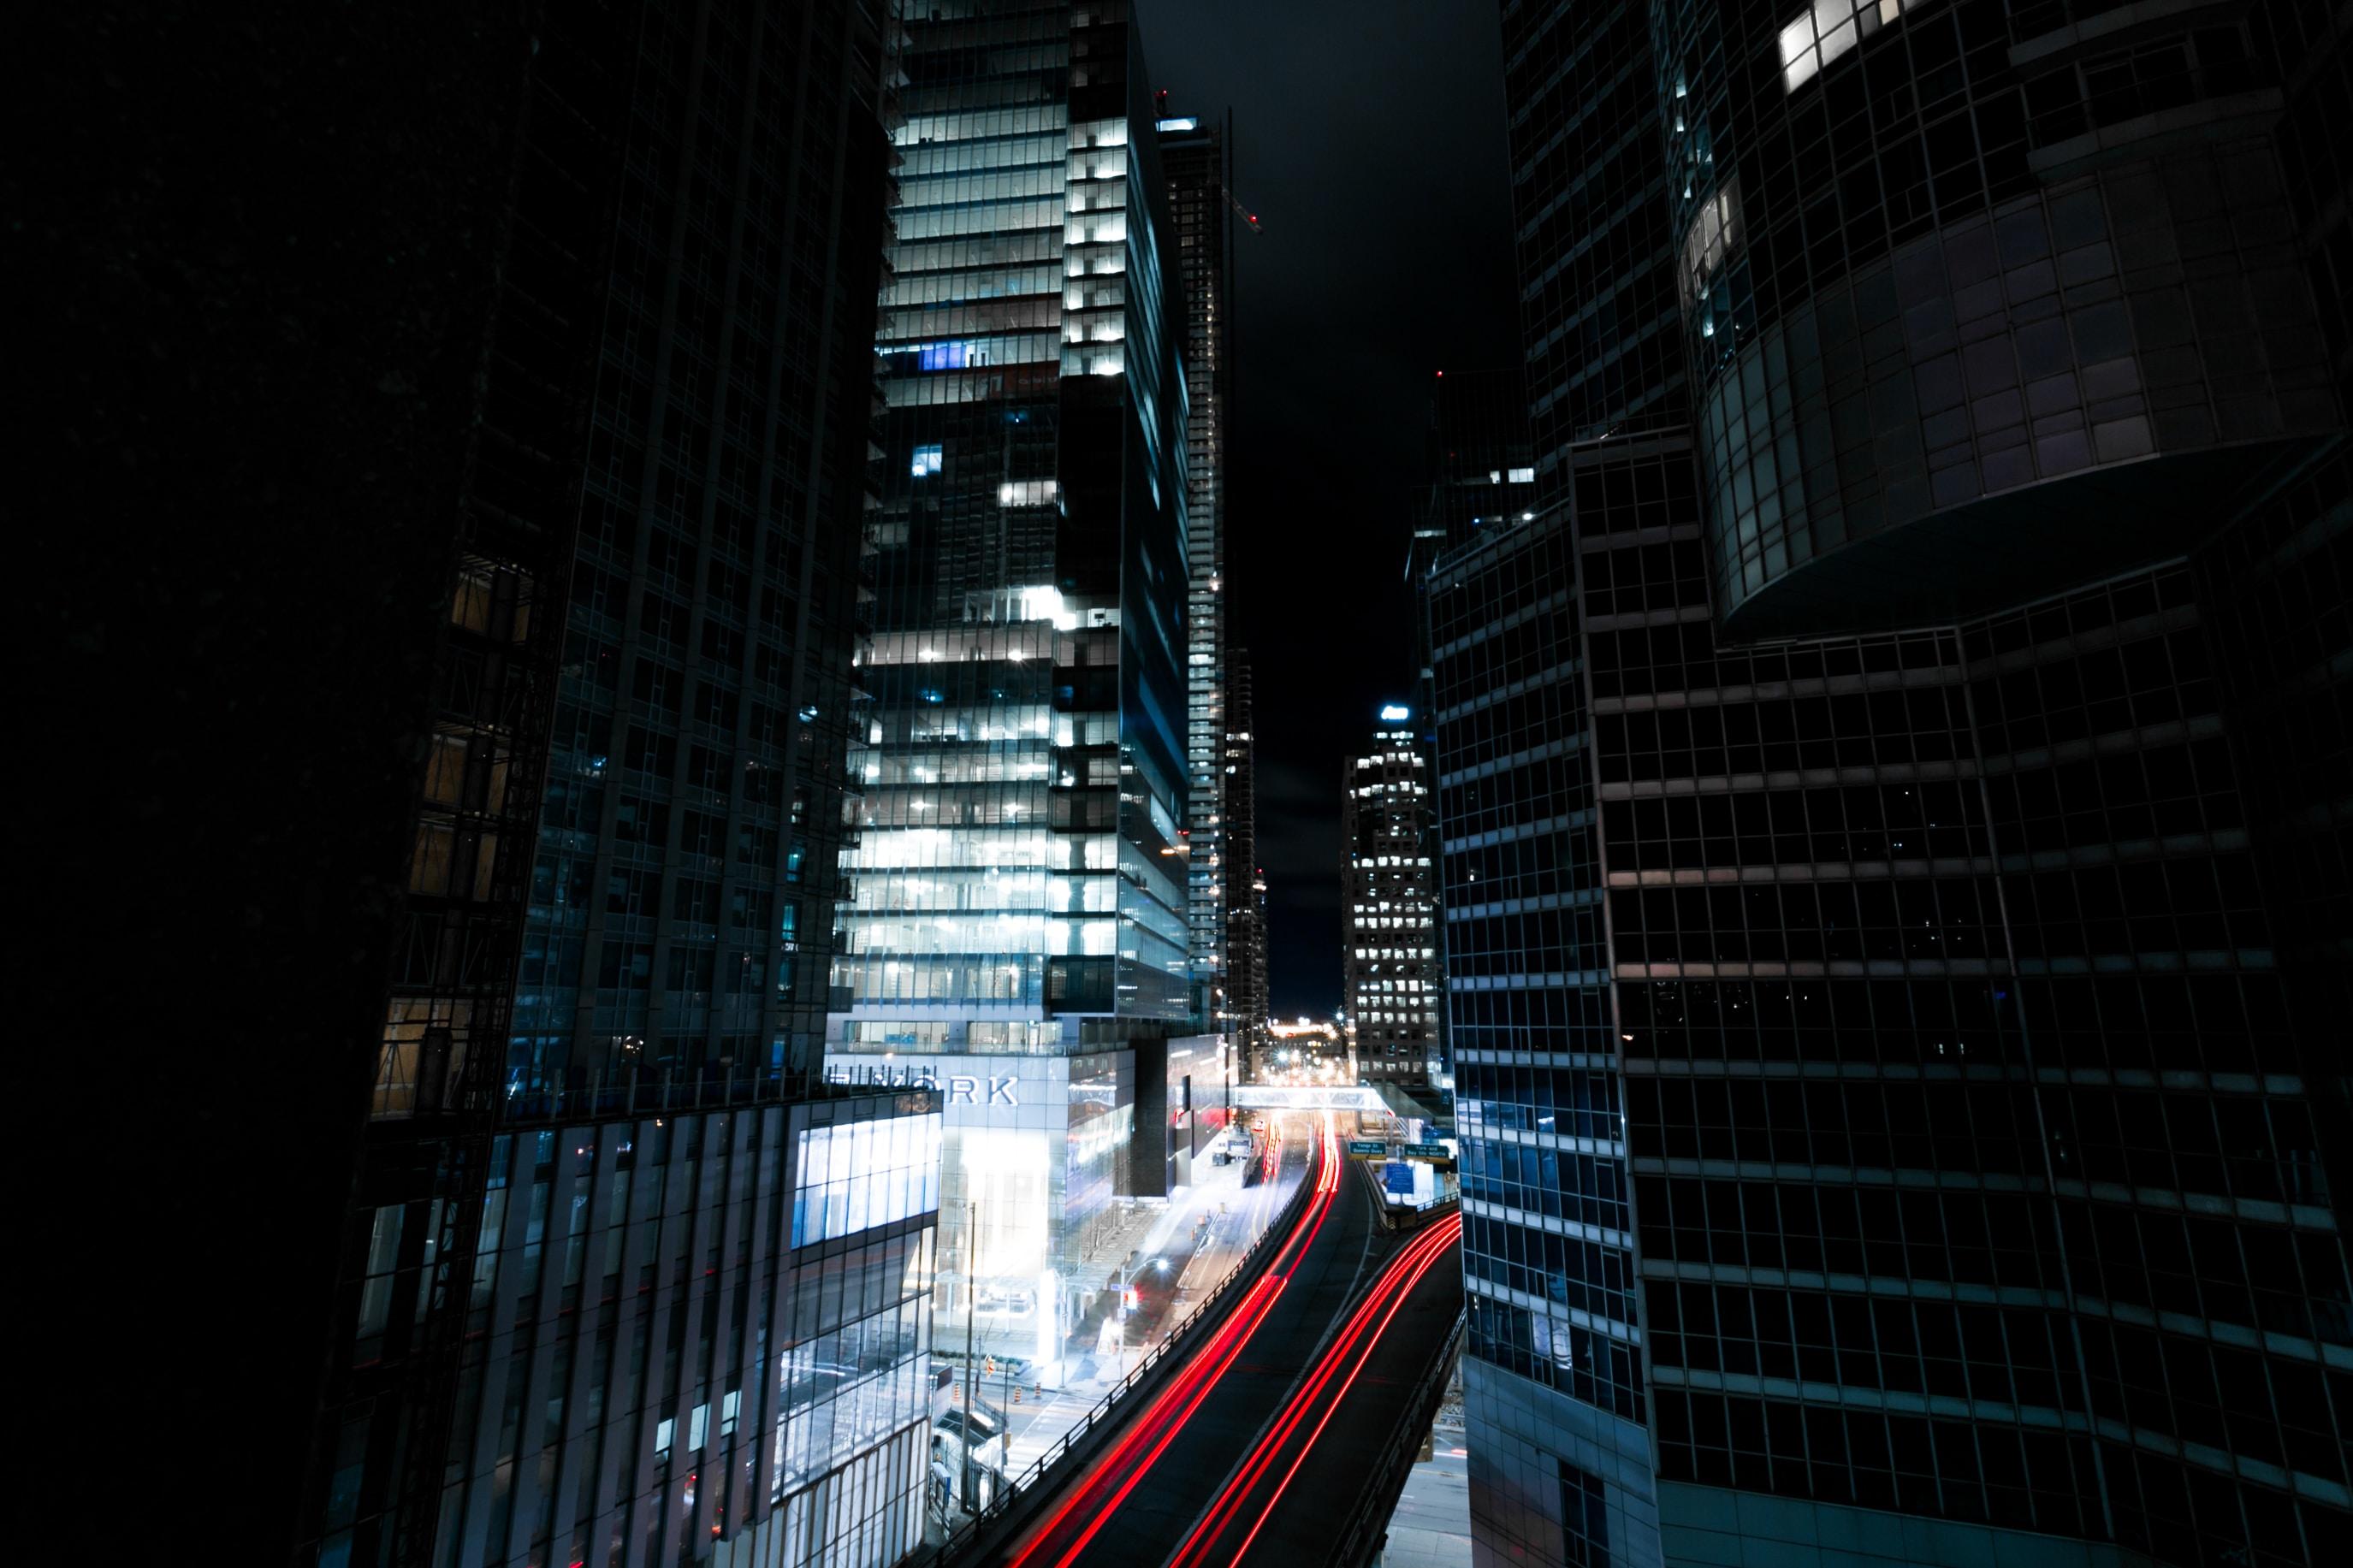 A dark photo of a dimly lit urban building with traffic light trails below